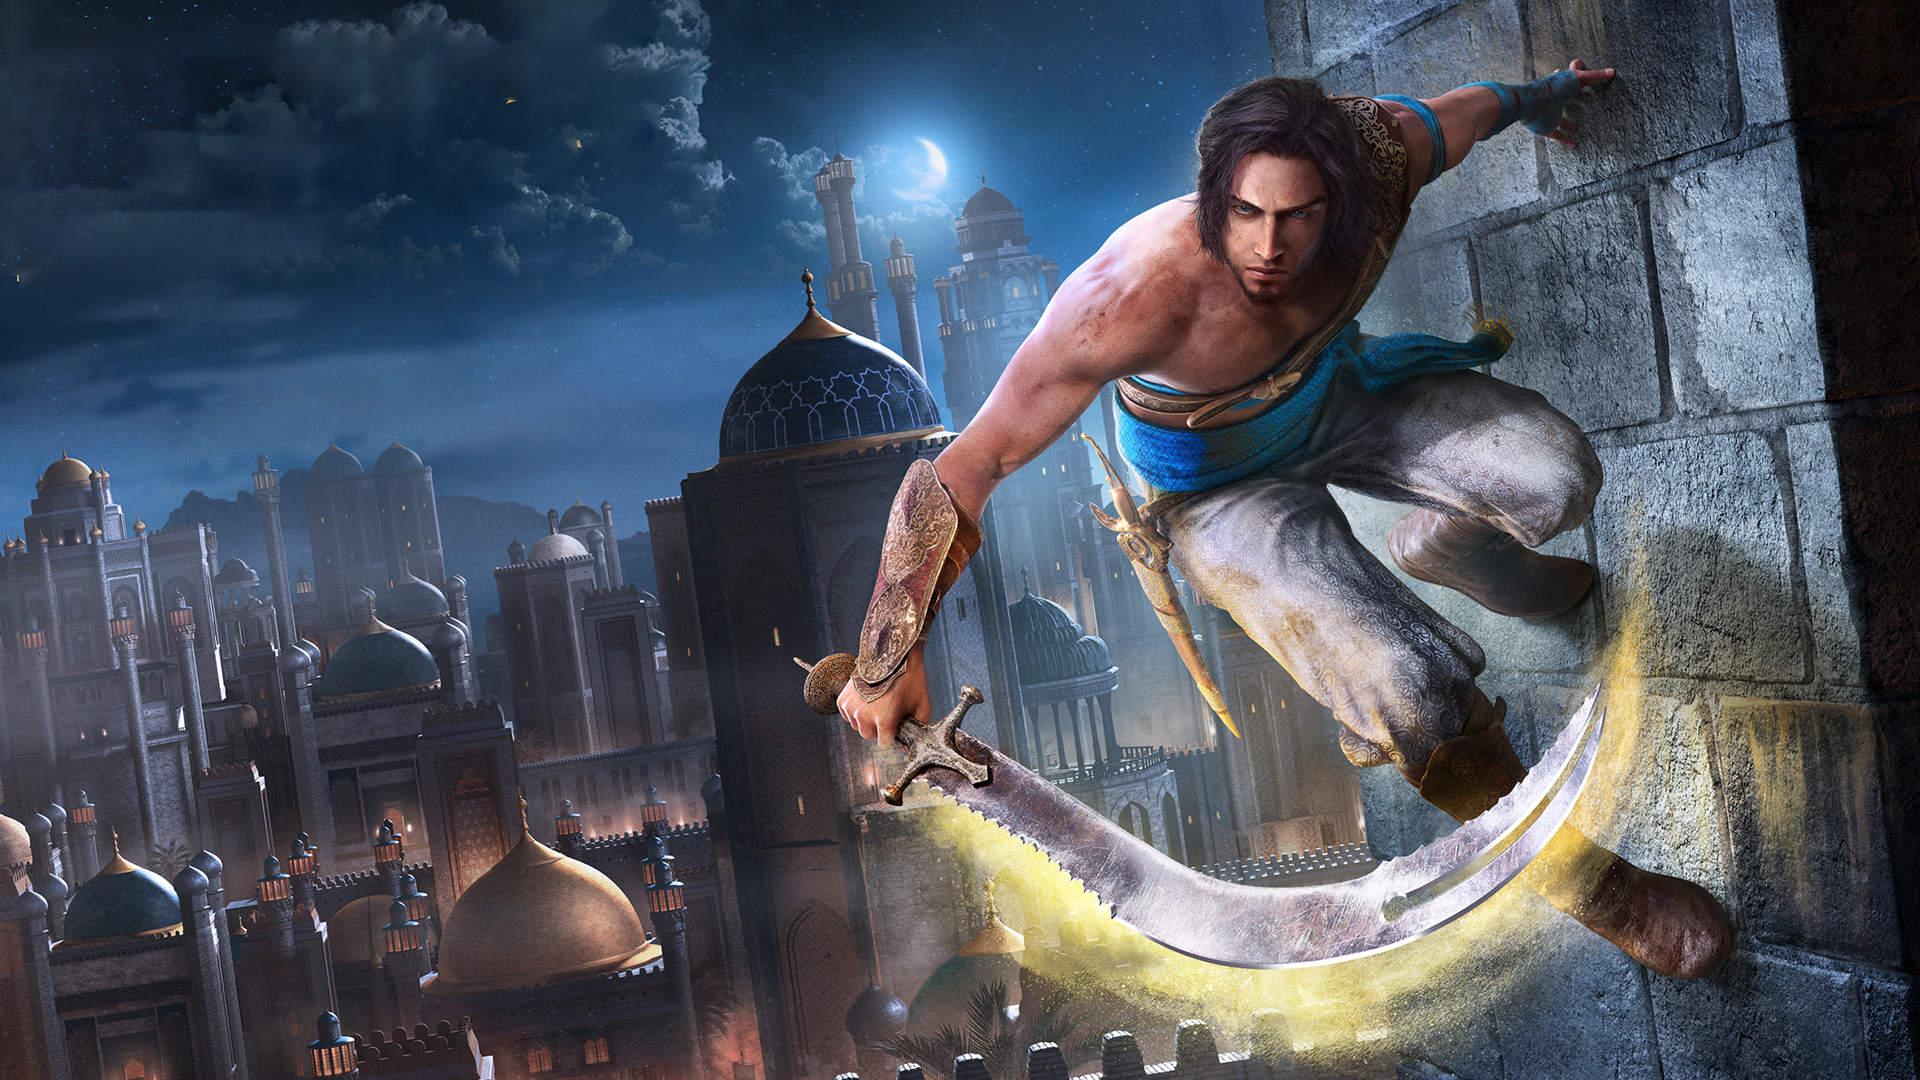 Prince of Persia 862021 2